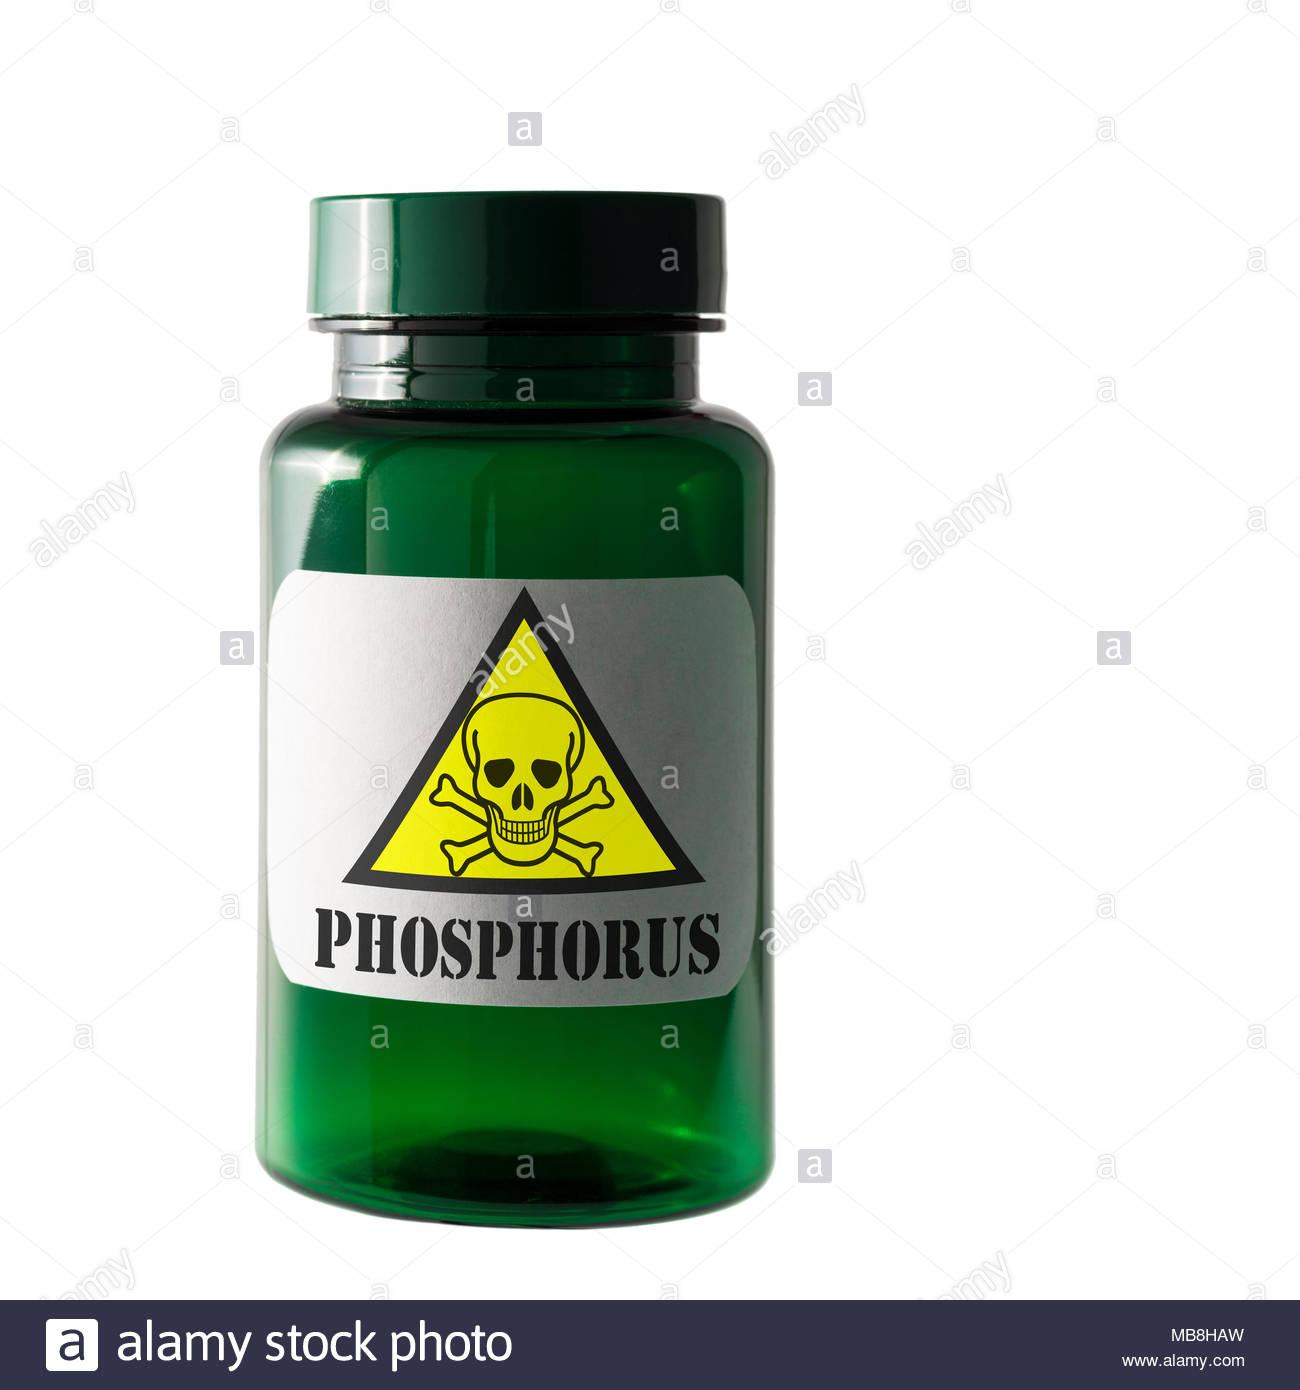 Phosphorus, Dangerous substance label, Dorset, England, UK - Stock Image